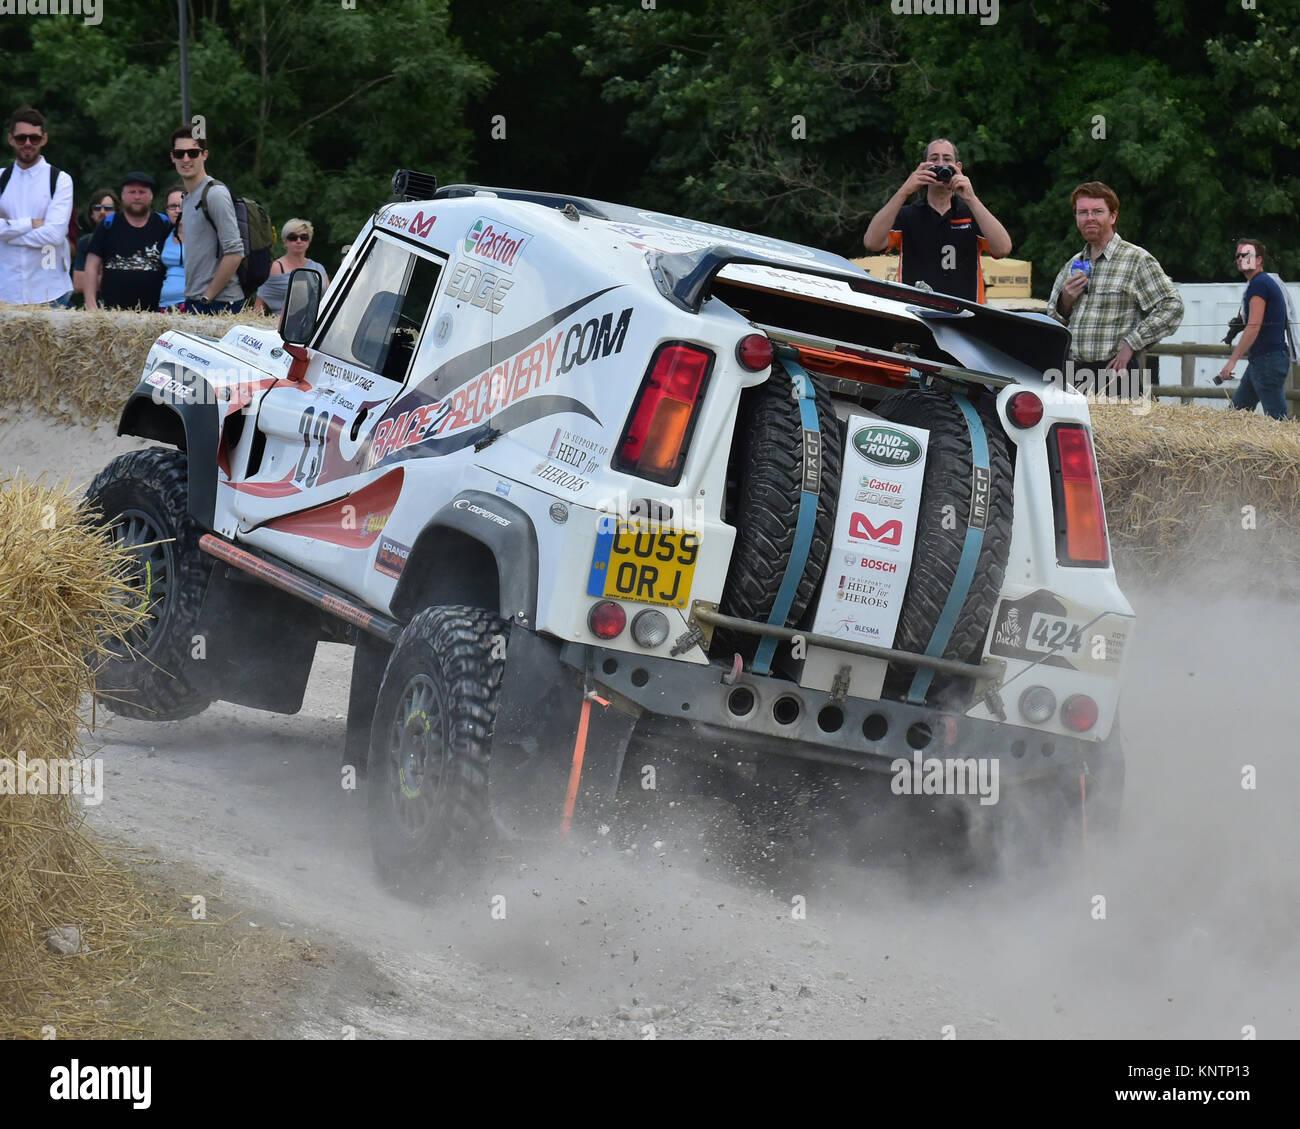 Ben Gott, Anthony Harris, QT Wildcat, CU 59 ORJ, Goodwood Festival of Speed, 2014, 2014, Anthony Harris, Autosport, - Stock Image